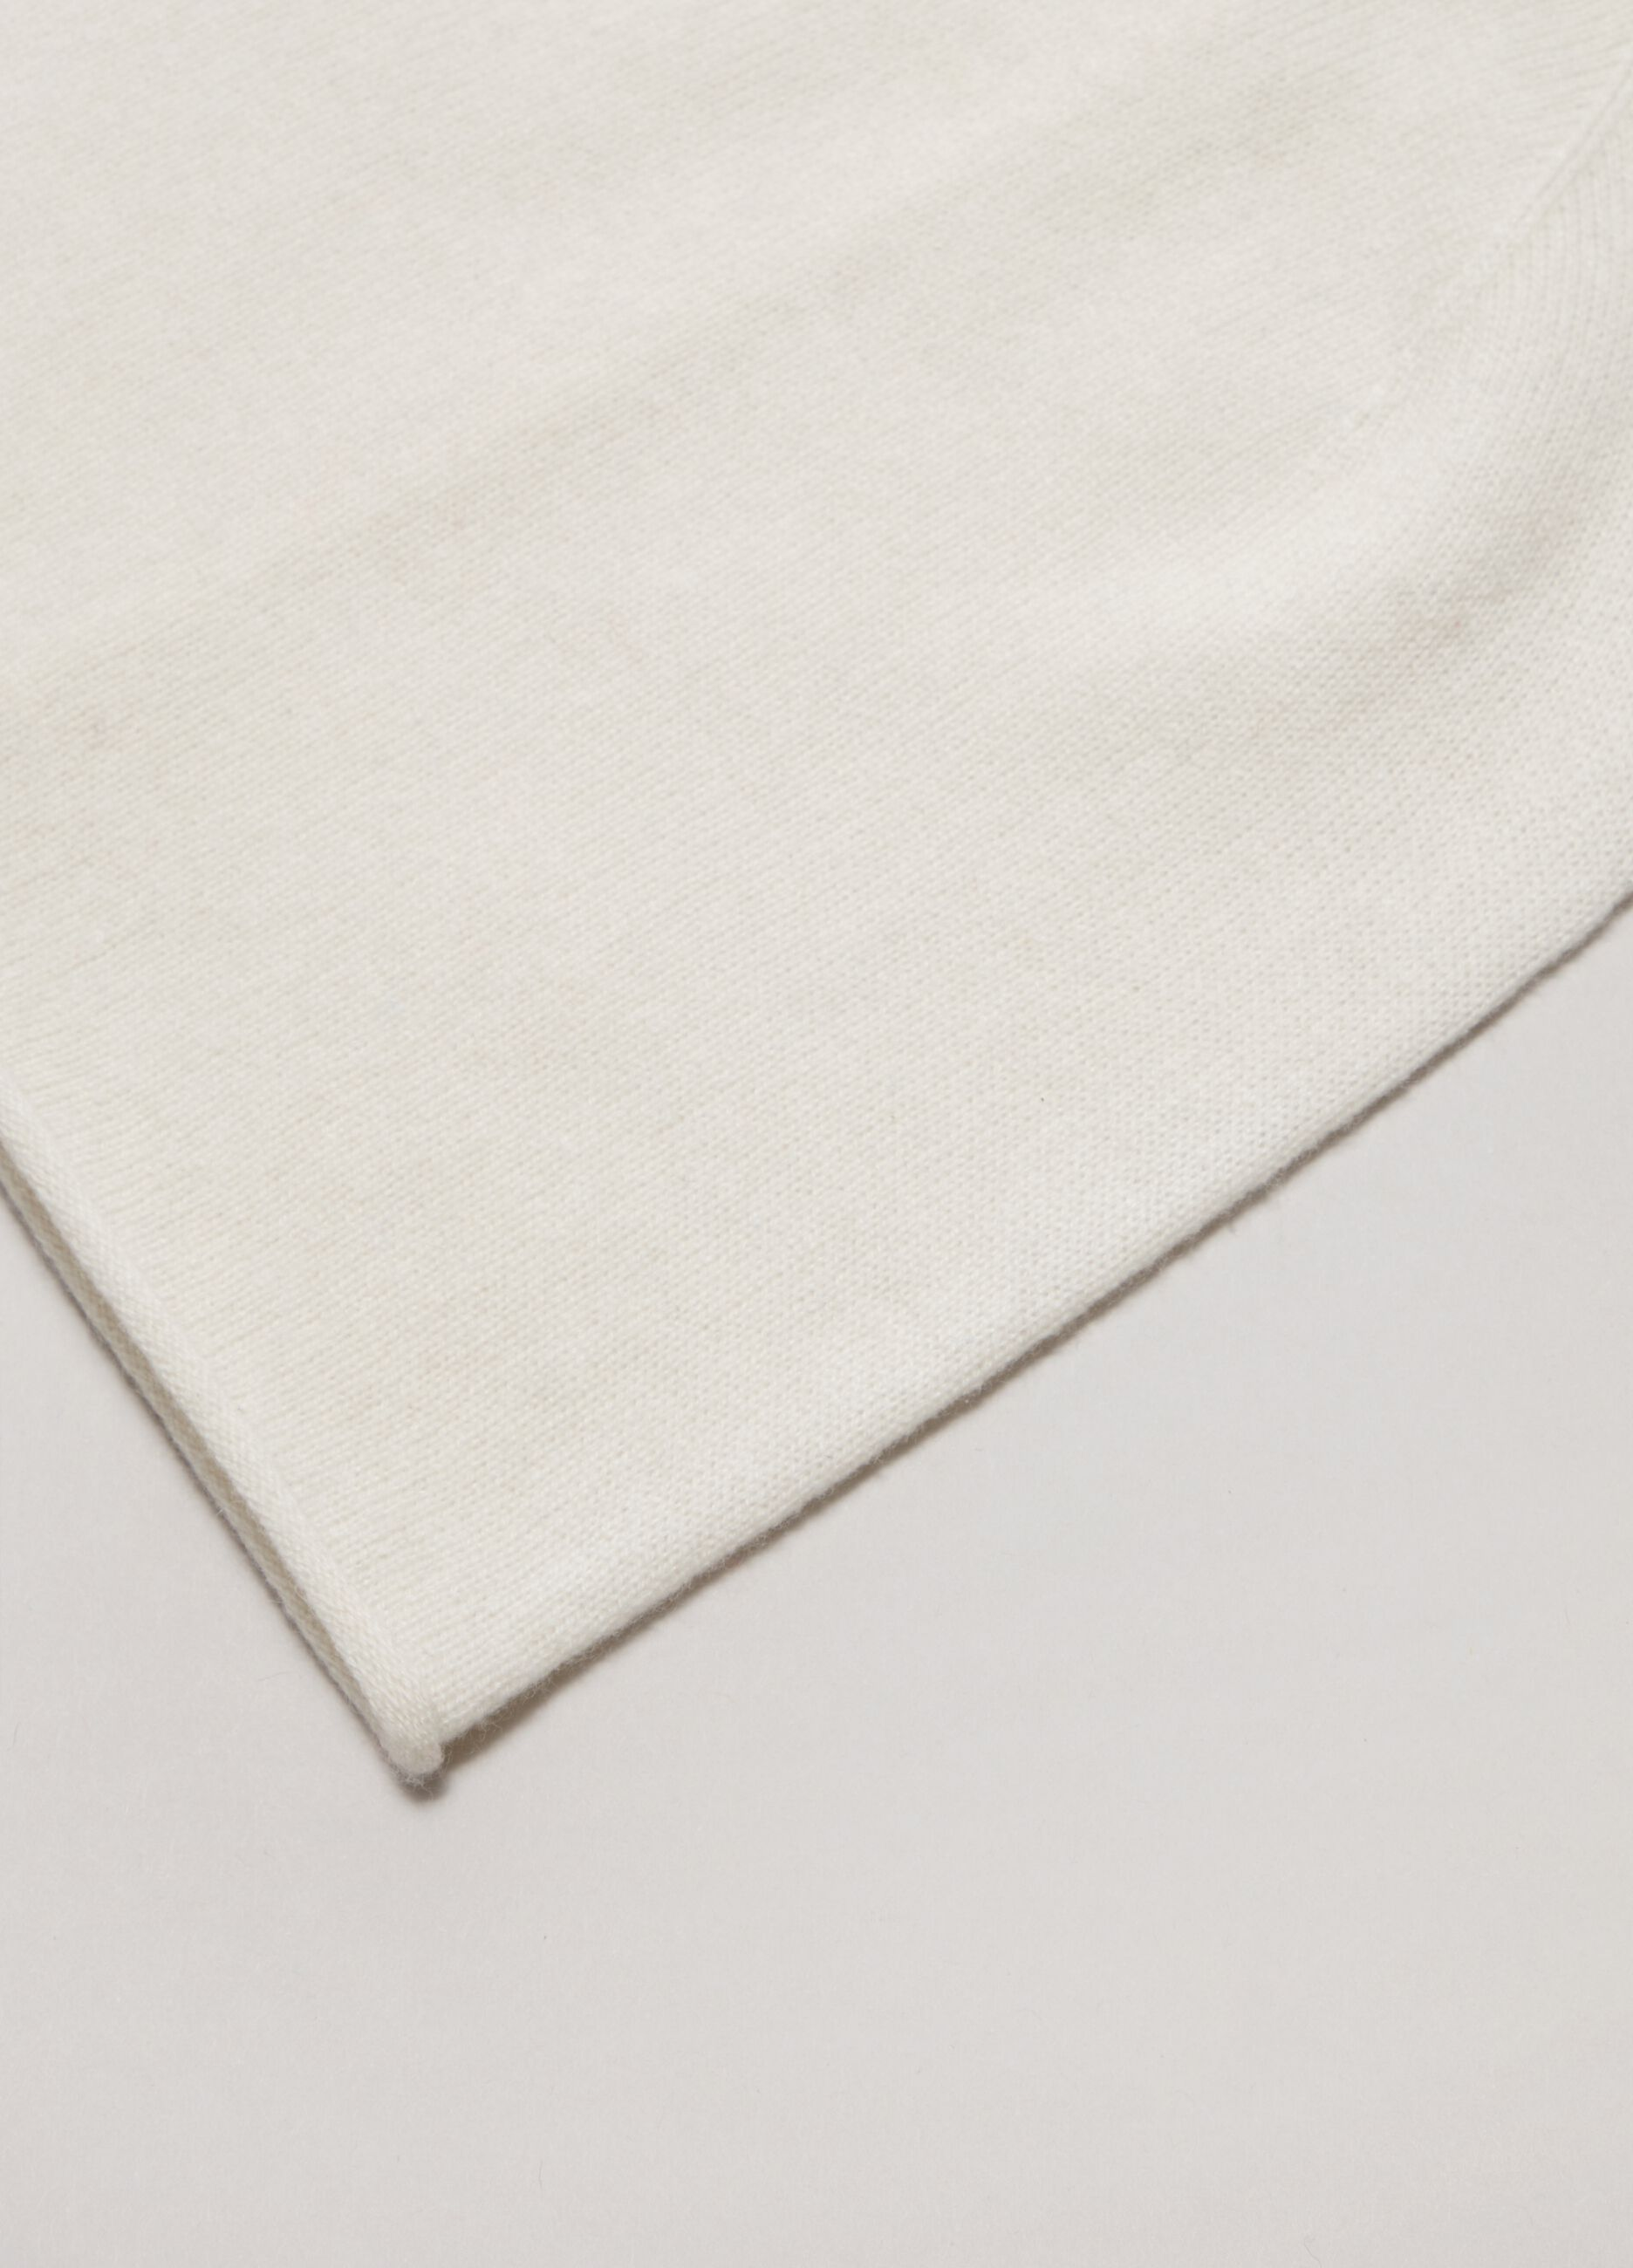 Cuffia in puro cachemire Bianco